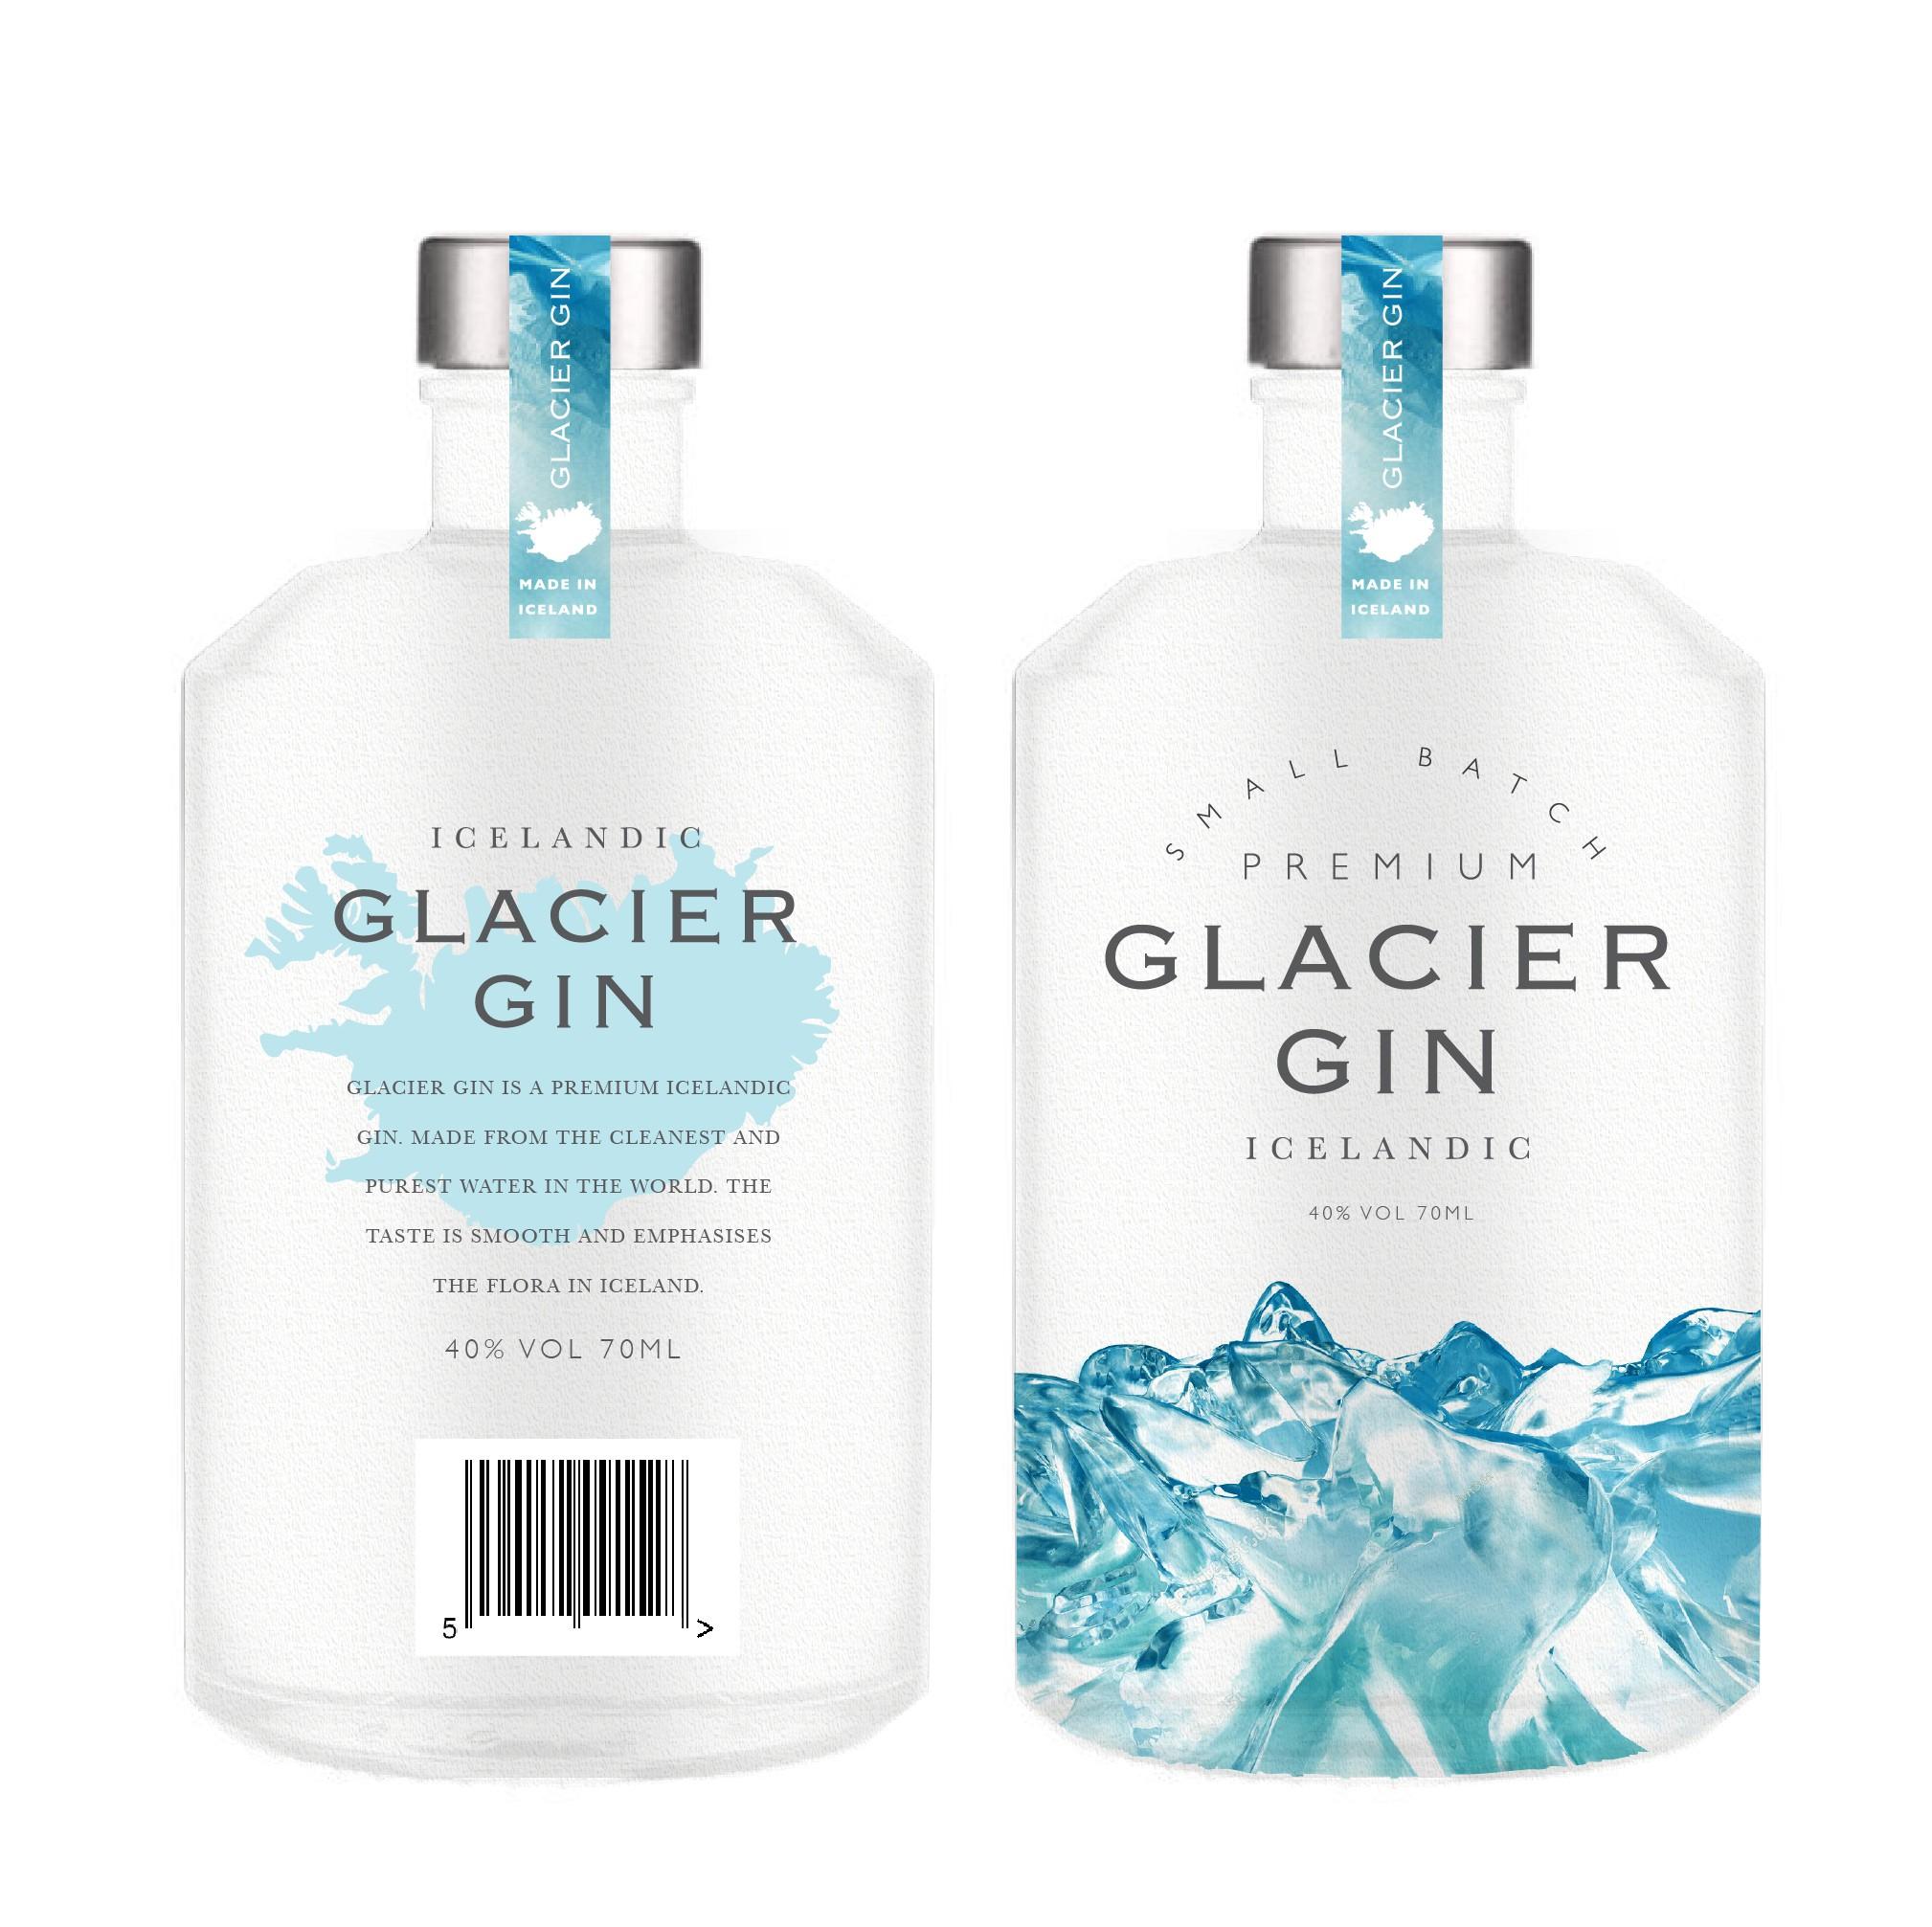 Design a premium gin bottle for Iceland